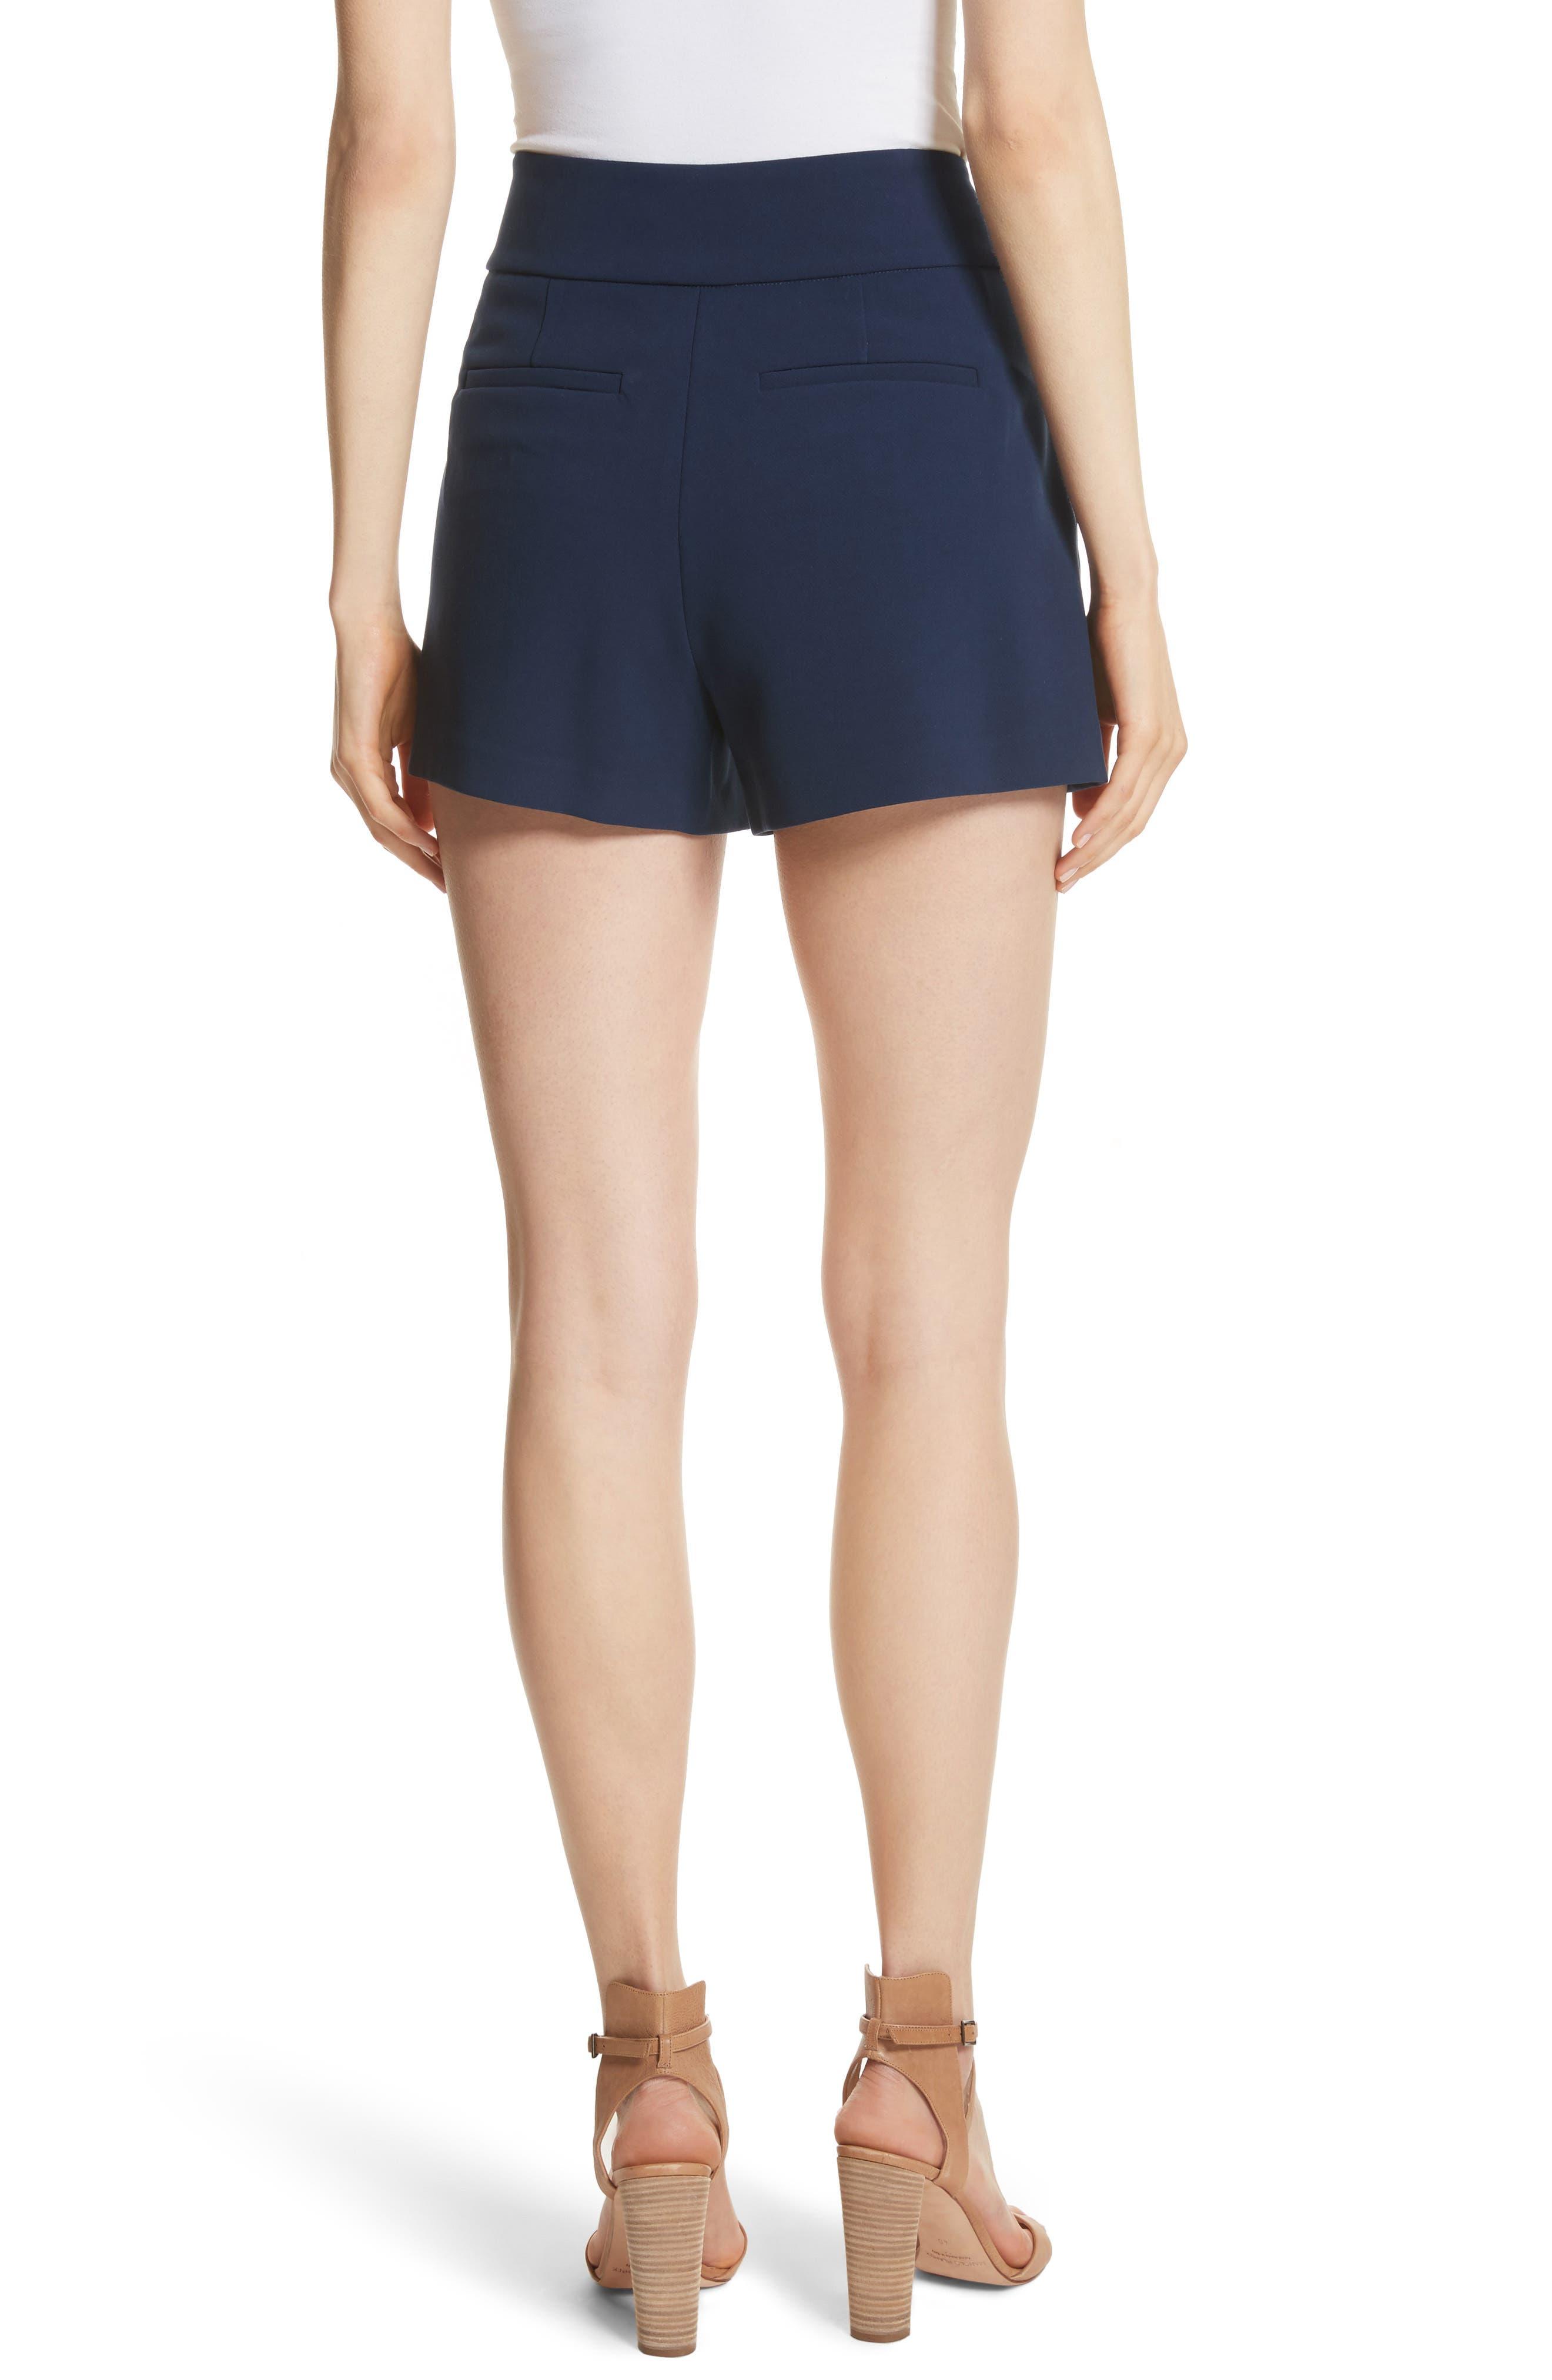 Donald High Waist Sailor Shorts,                             Alternate thumbnail 2, color,                             Sapphire